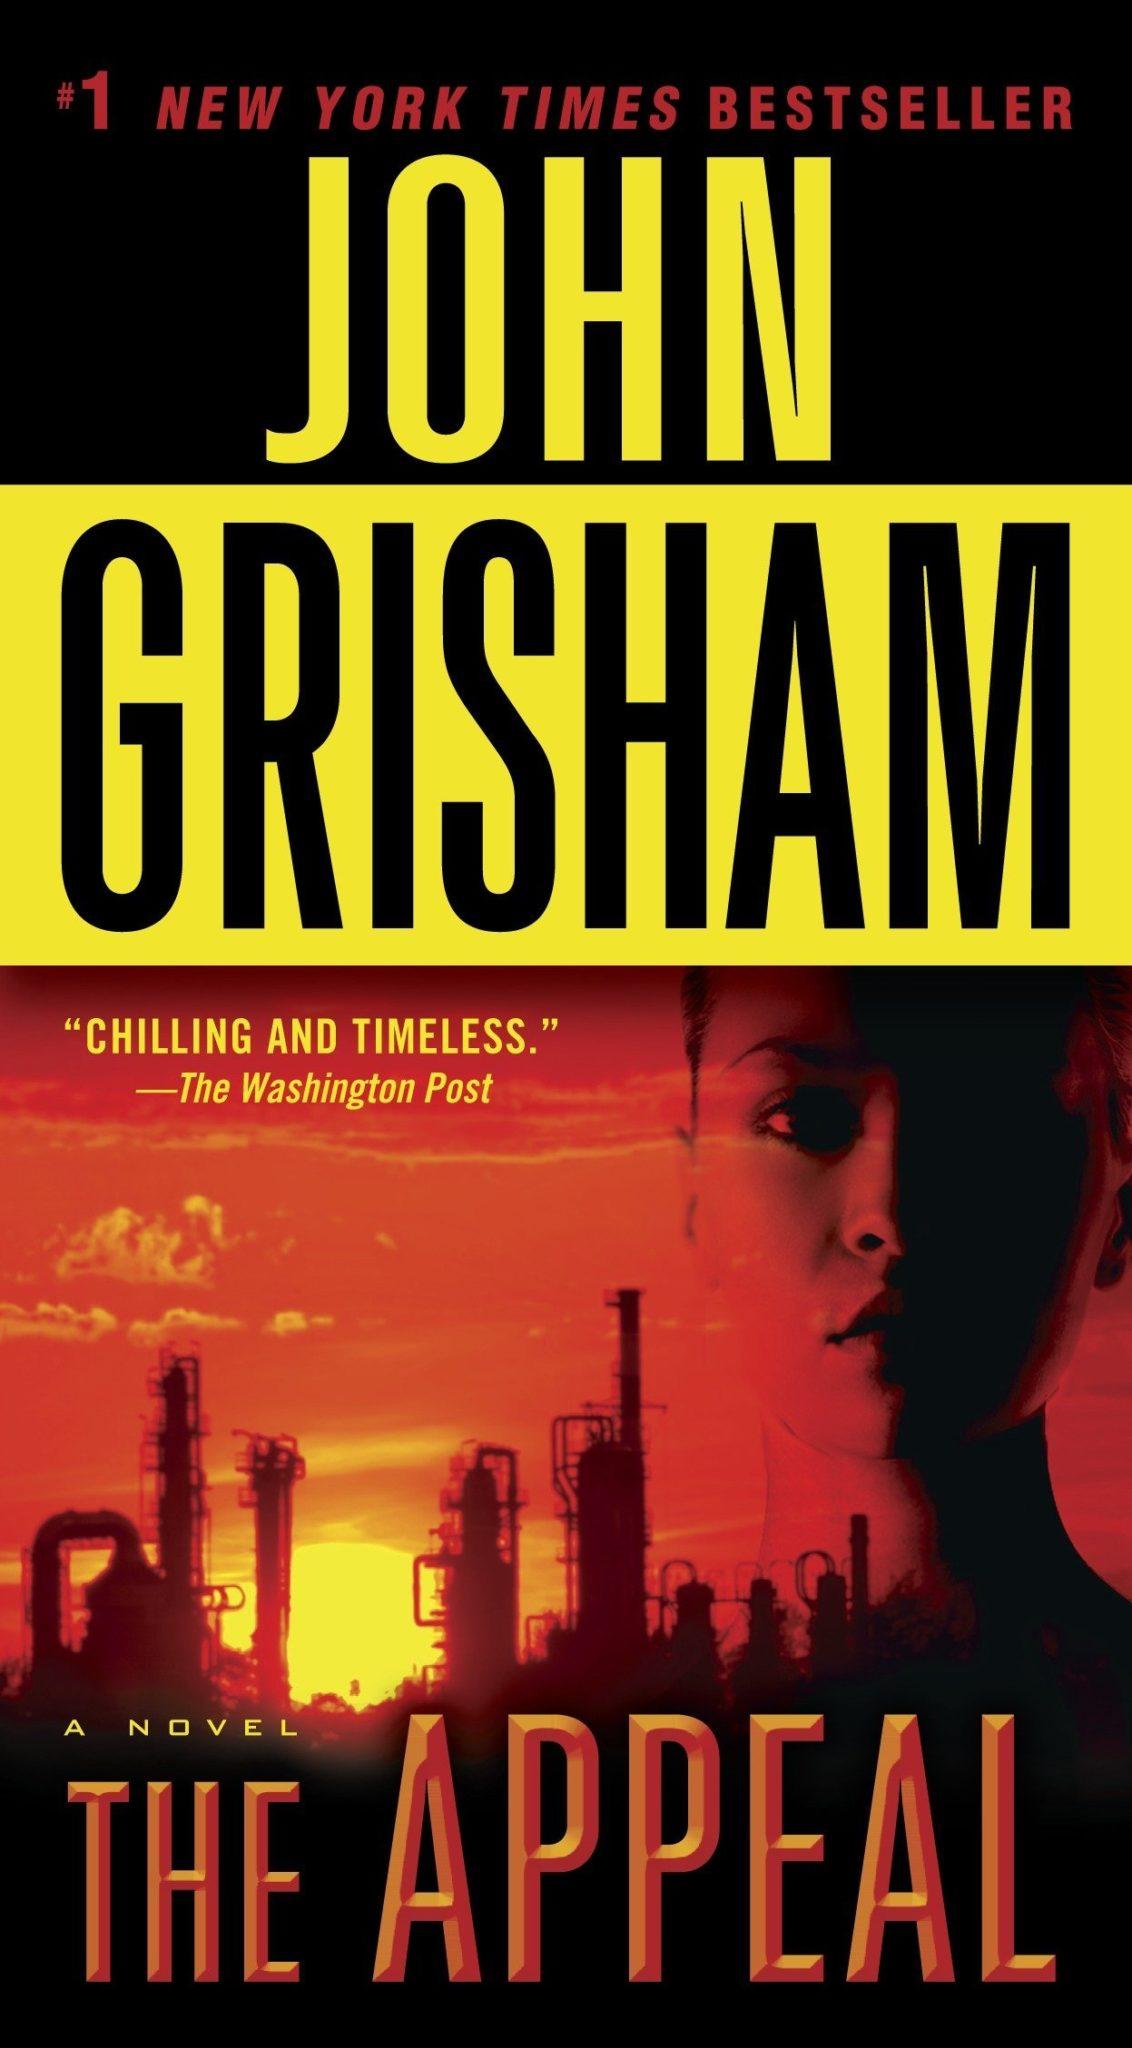 John Grisham books 22